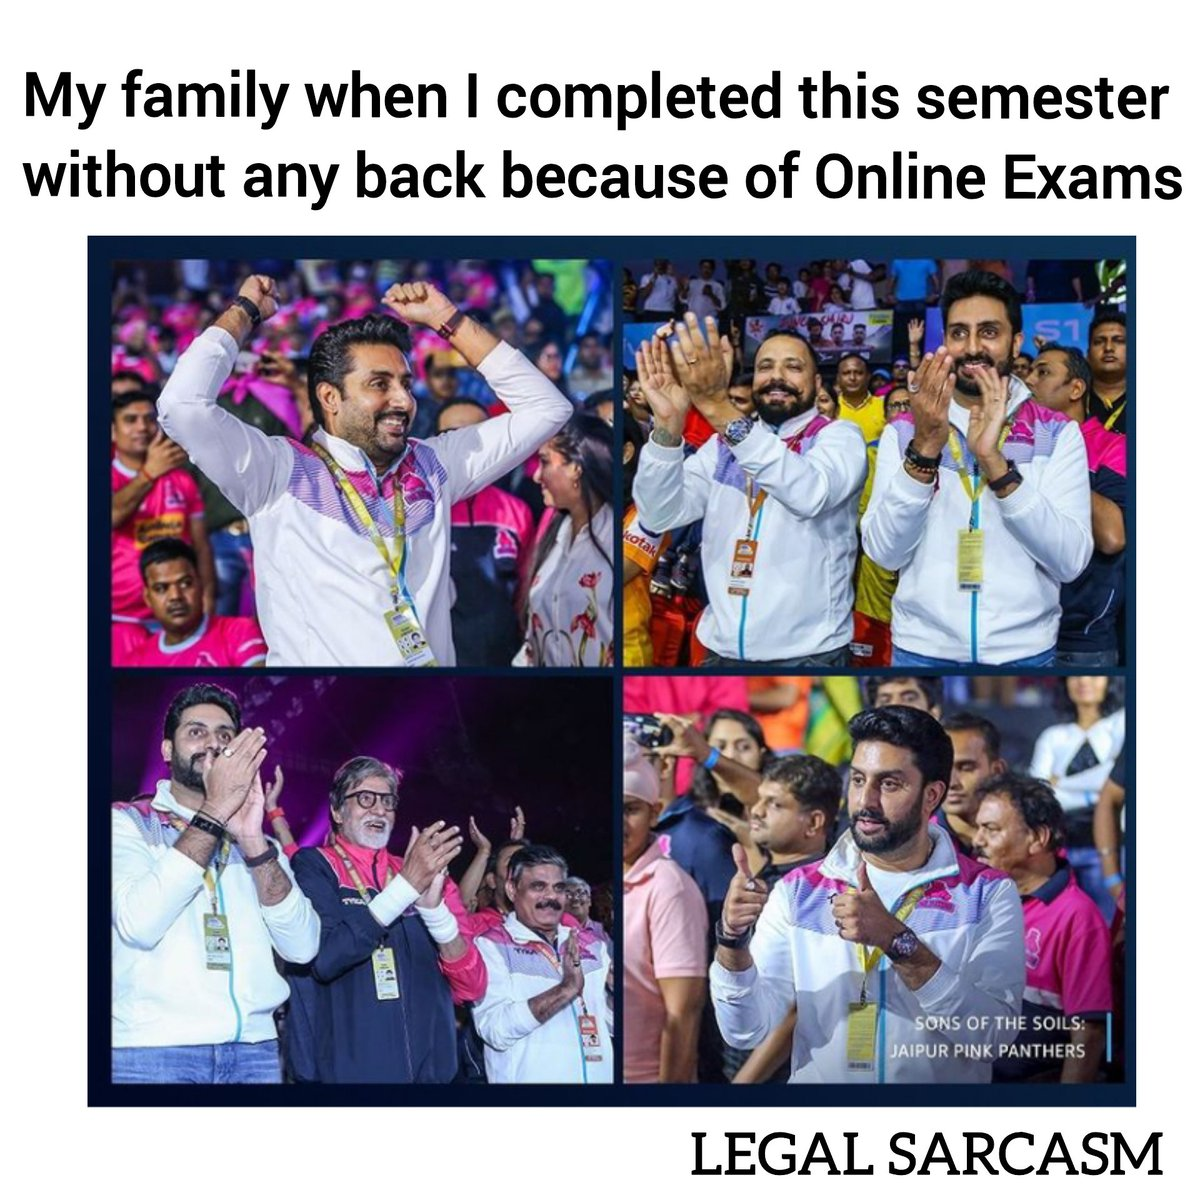 #law #lawstudent #Students #India #legal #legalmemes #humor #MEMES #memes2020 #lawschool #nlu #semester #exams2021 #OnlineClasses #online #AbhishekBachchan #AmitabhBachchan #AmazonPrime #sonsofthesoil